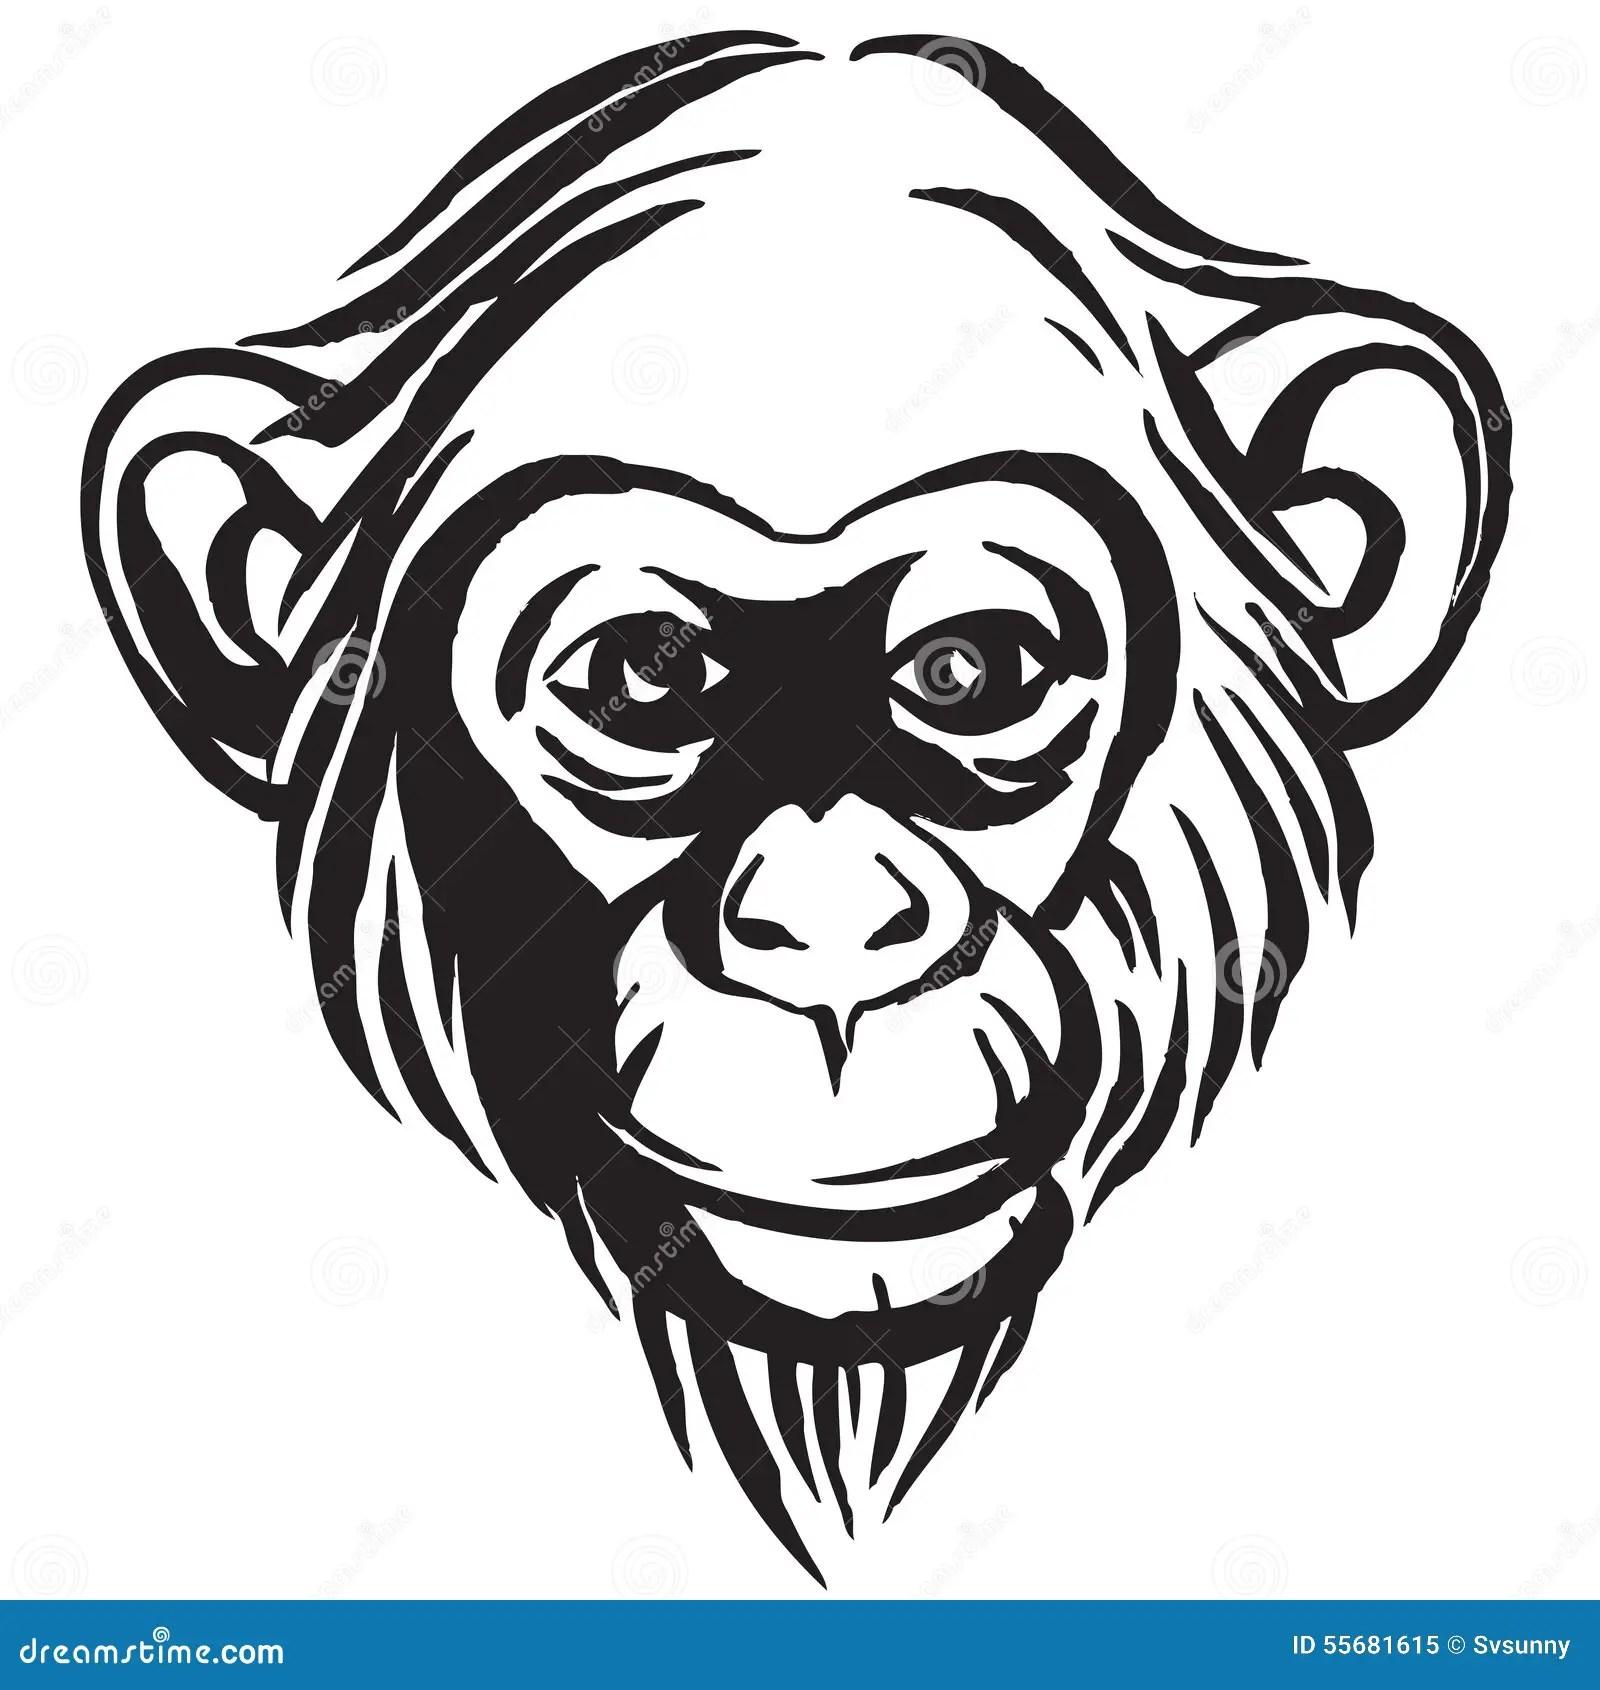 Hand Drawn Portrait Of Monkey Chimpanzee Black And White